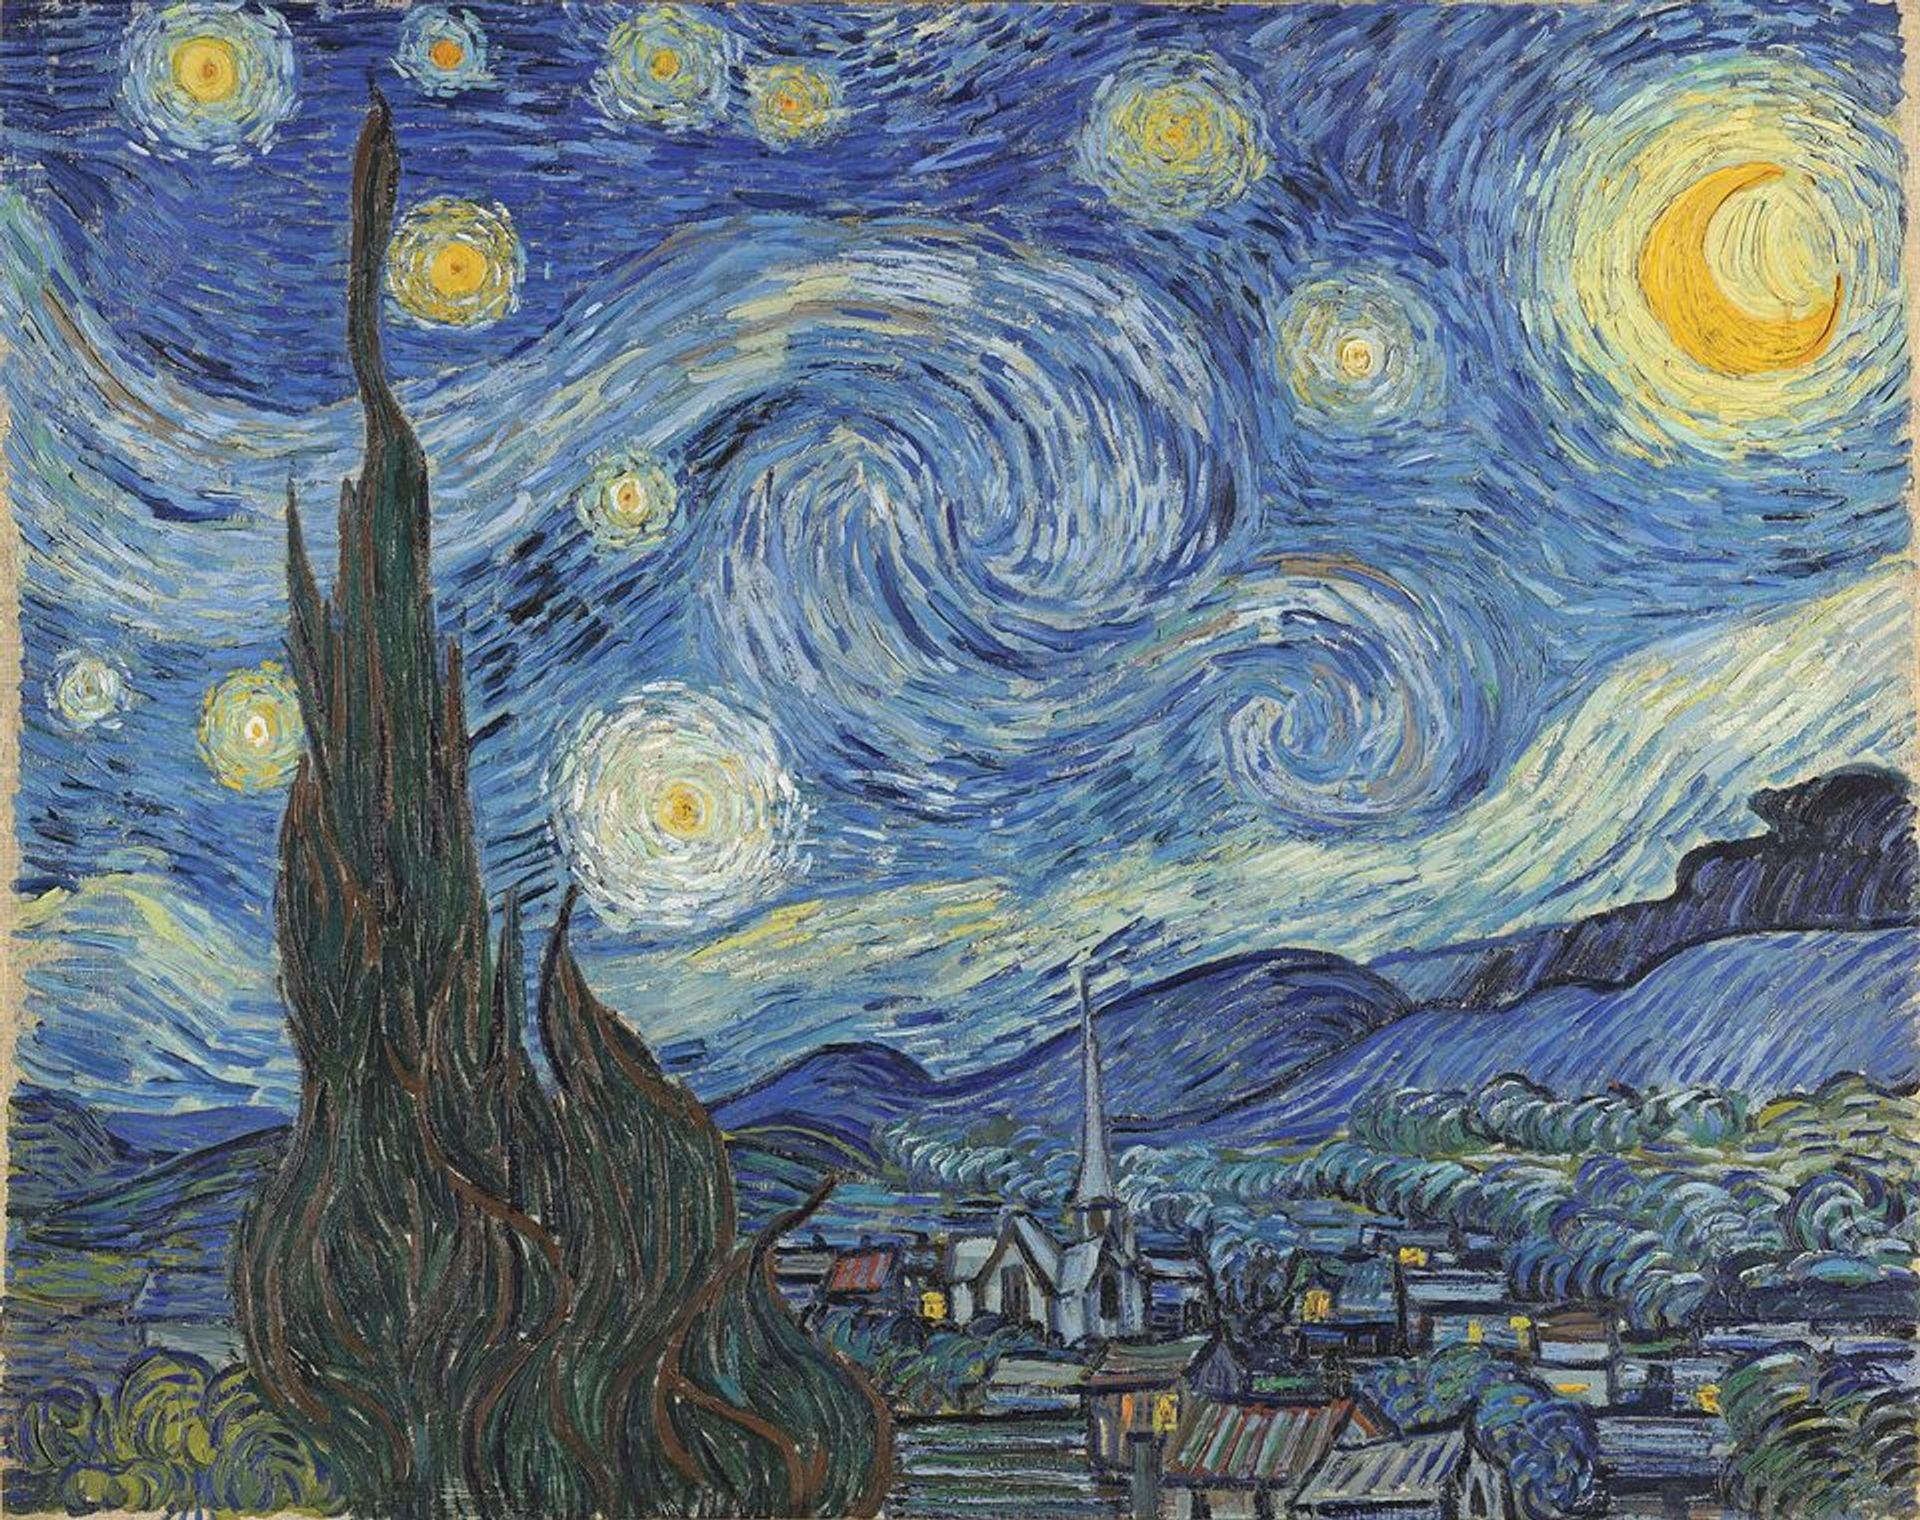 Van Gogh, Starry Night (painting), (June 1889) © Museum of Modern Art, New York Museum of Modern Art, New York, USA / Bridgeman Images